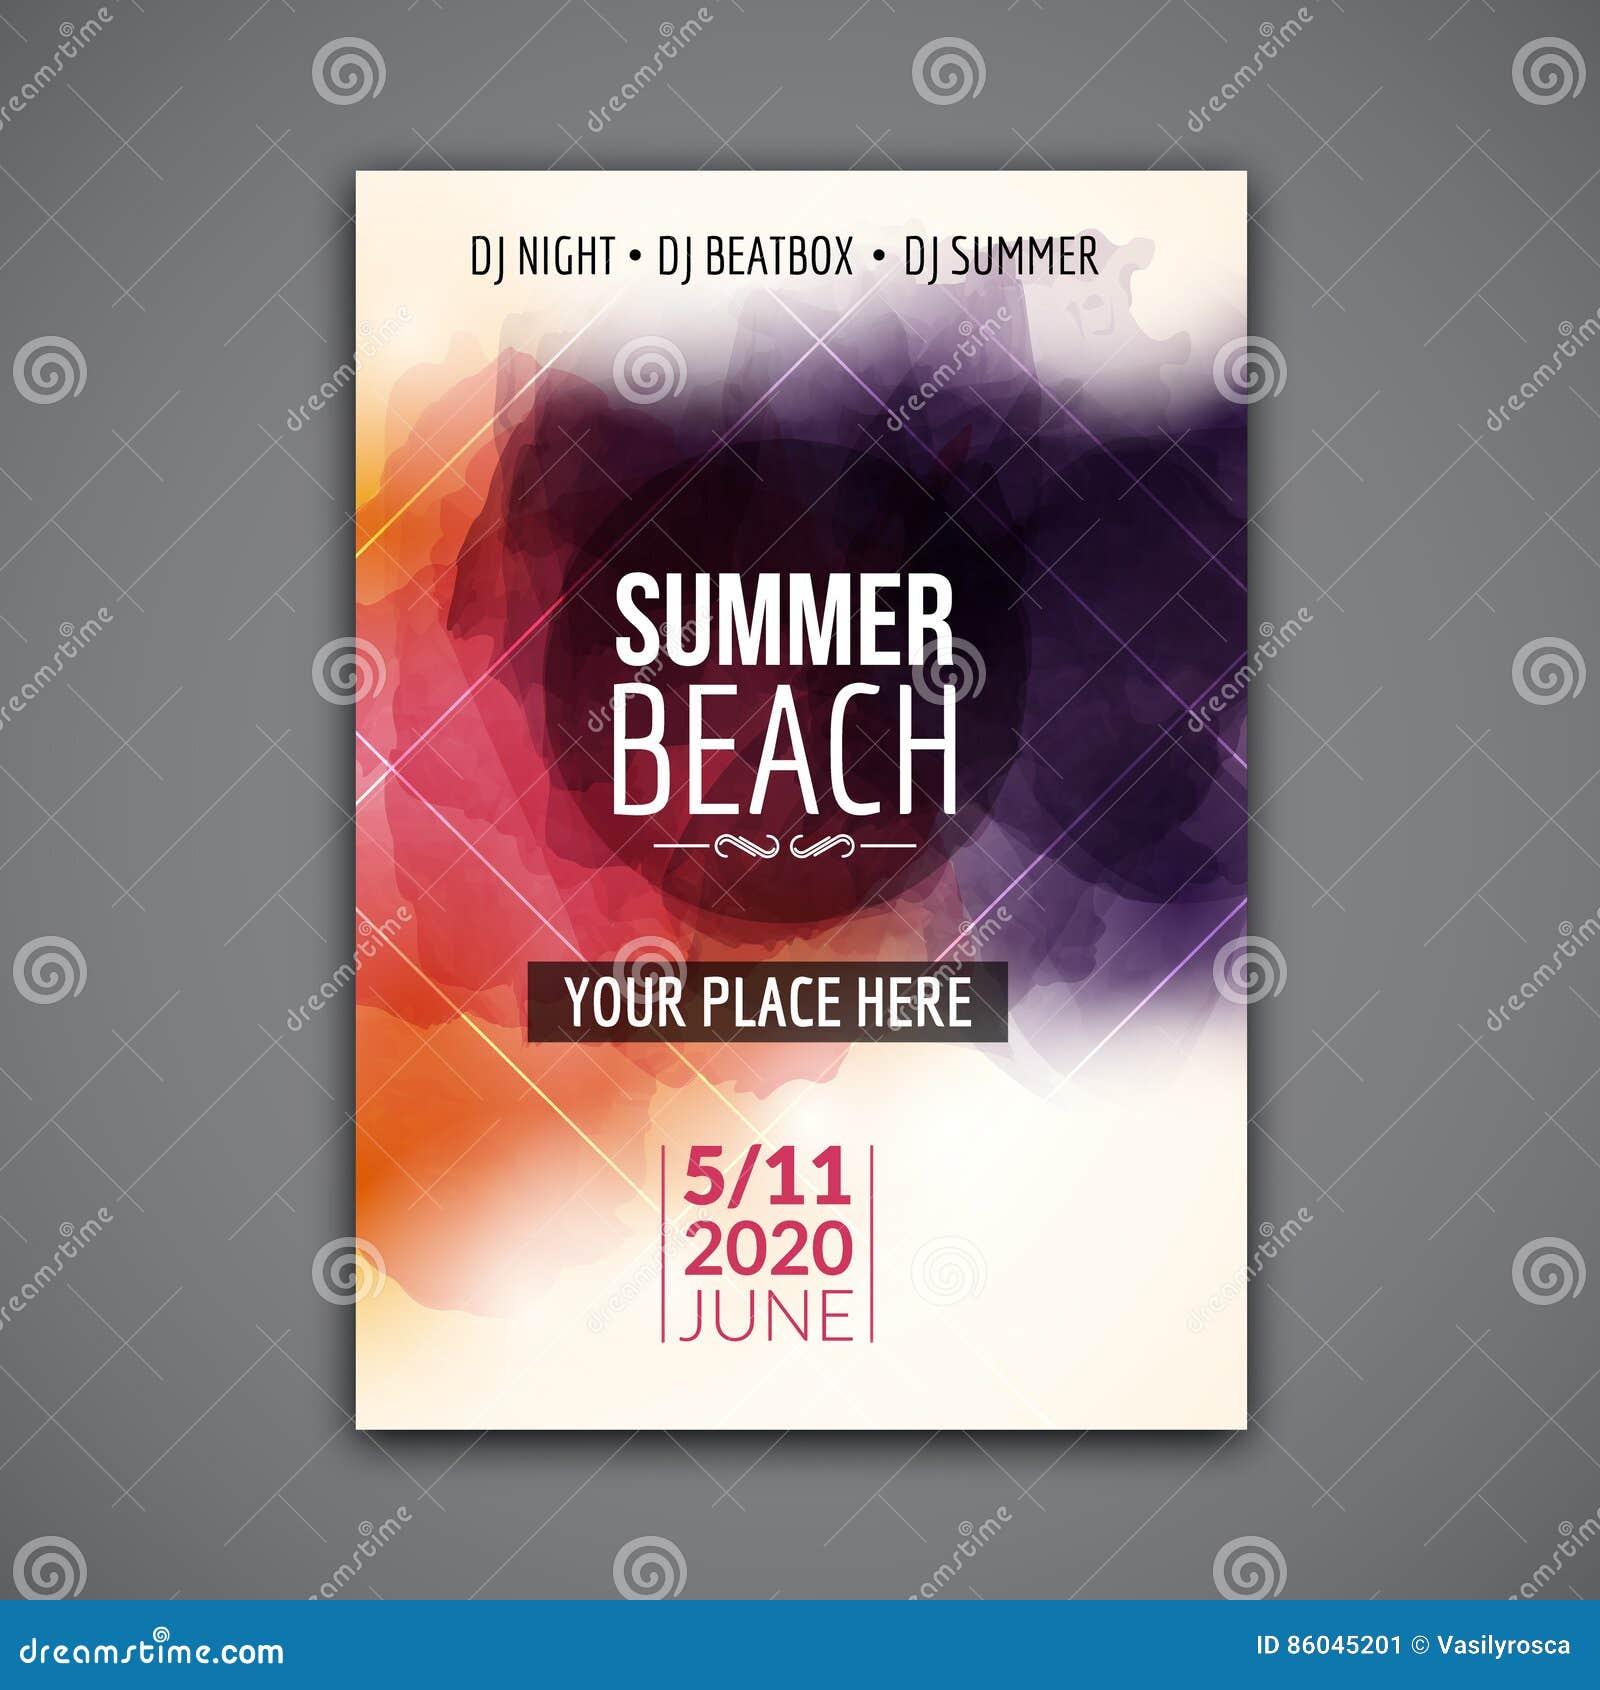 Summer Beach Party Flyer Template Design Summer Party Design Layout